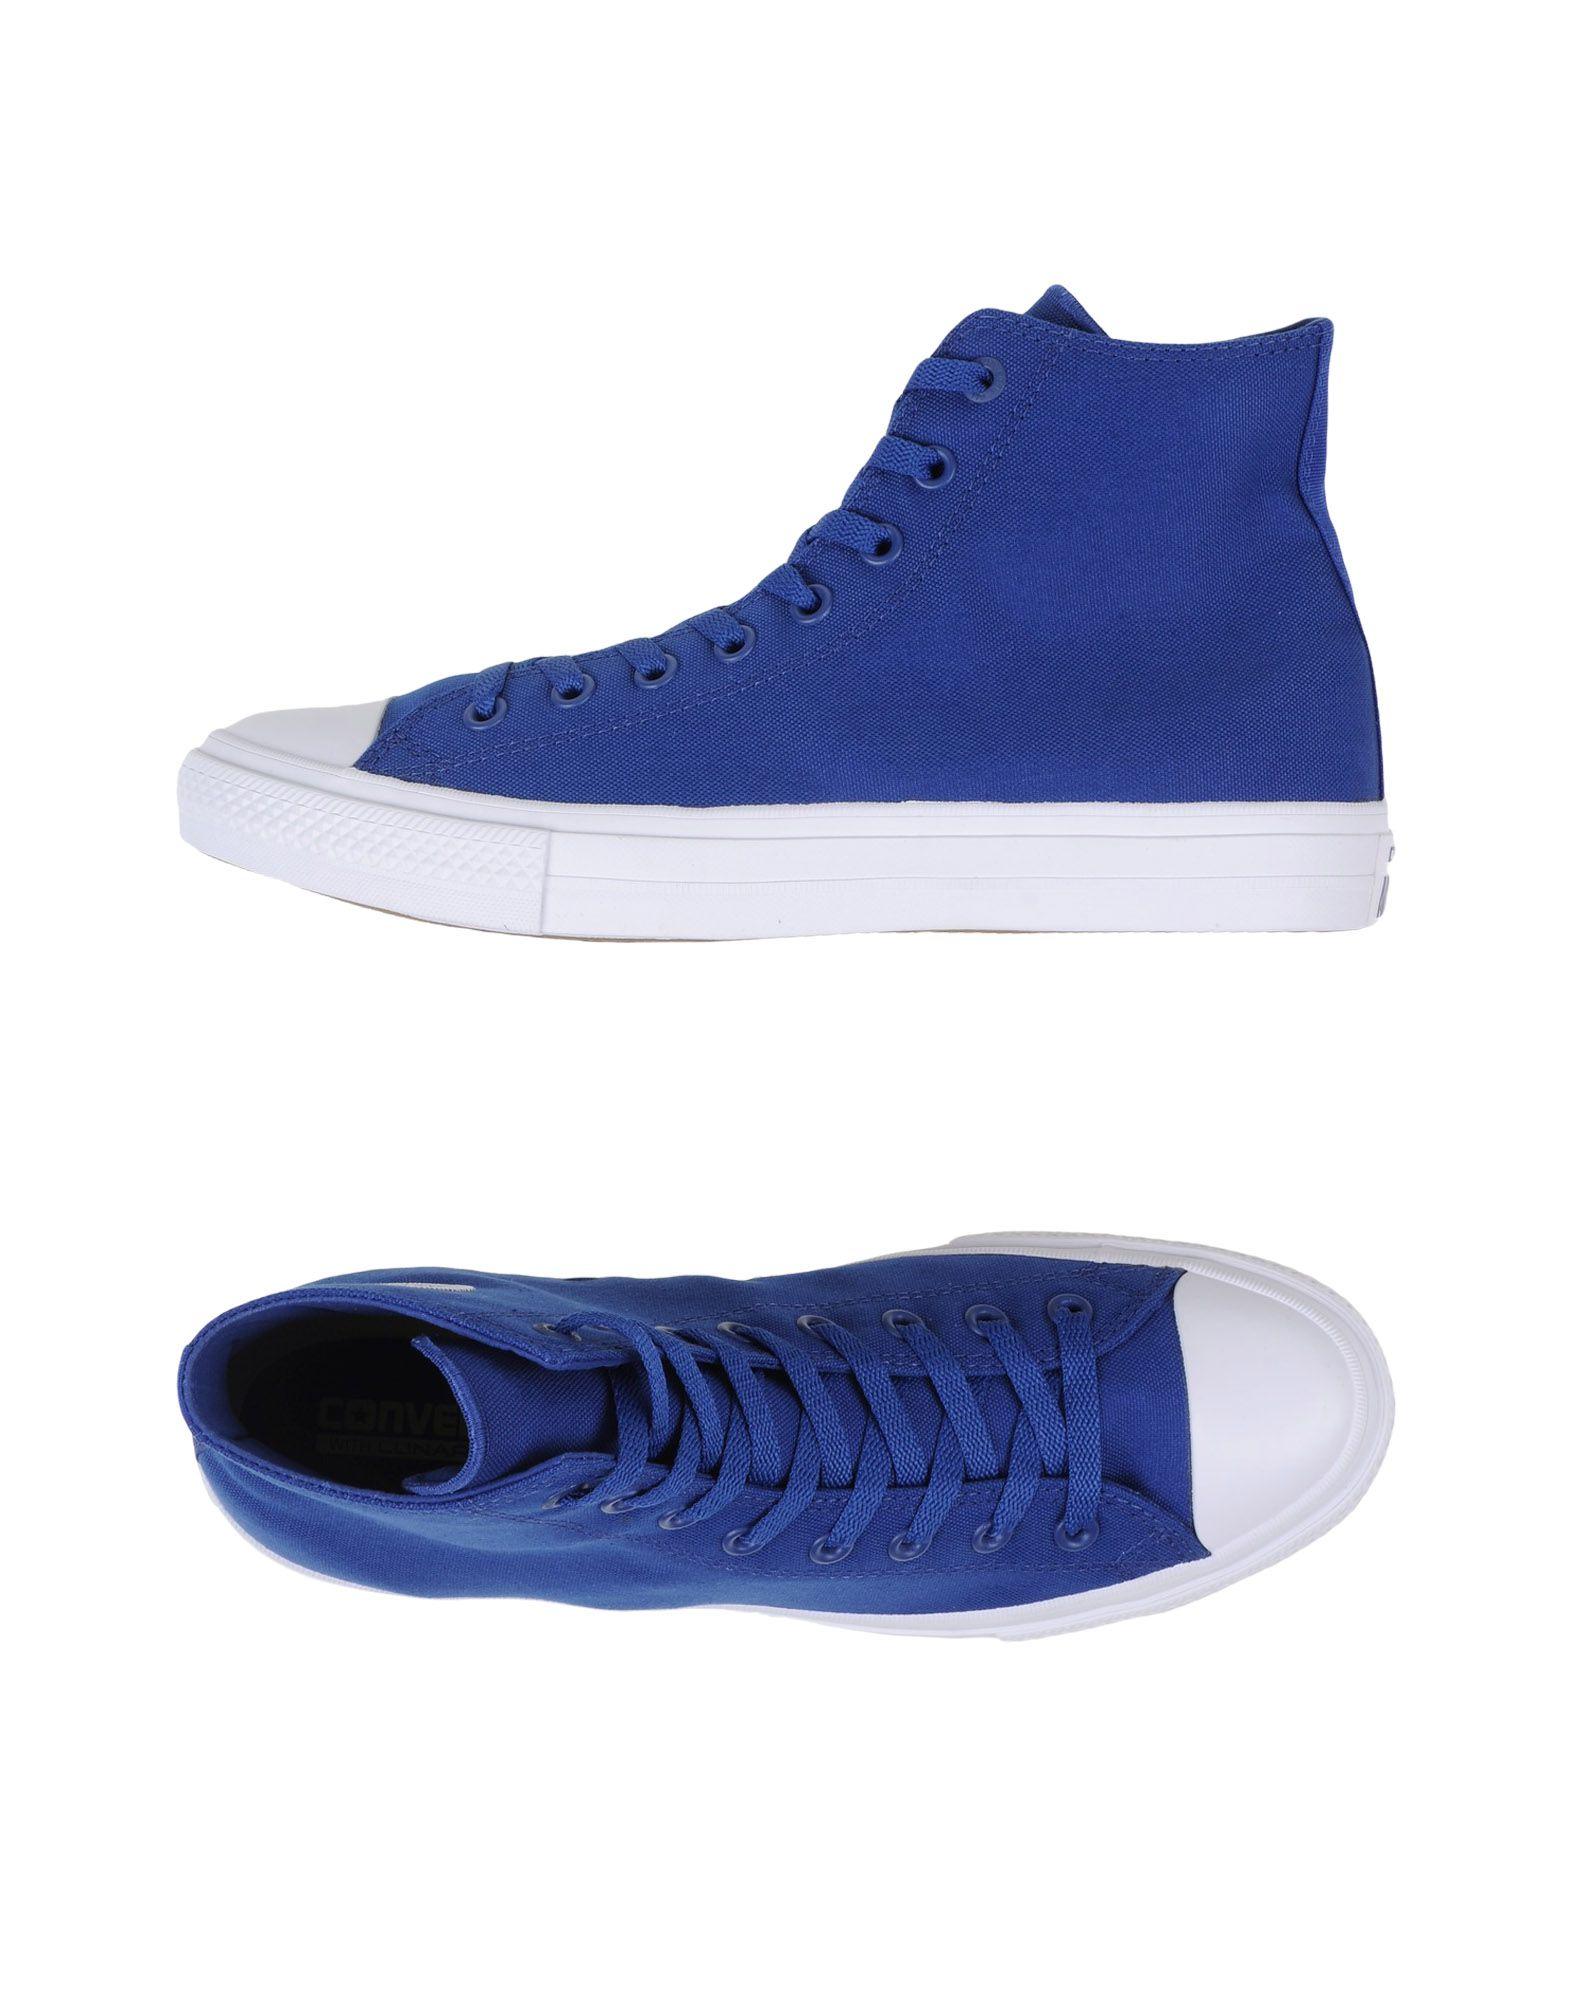 Sneakers Converse All Star Ct As Ii Hi Tencel Canvas - Homme - Sneakers Converse All Star sur